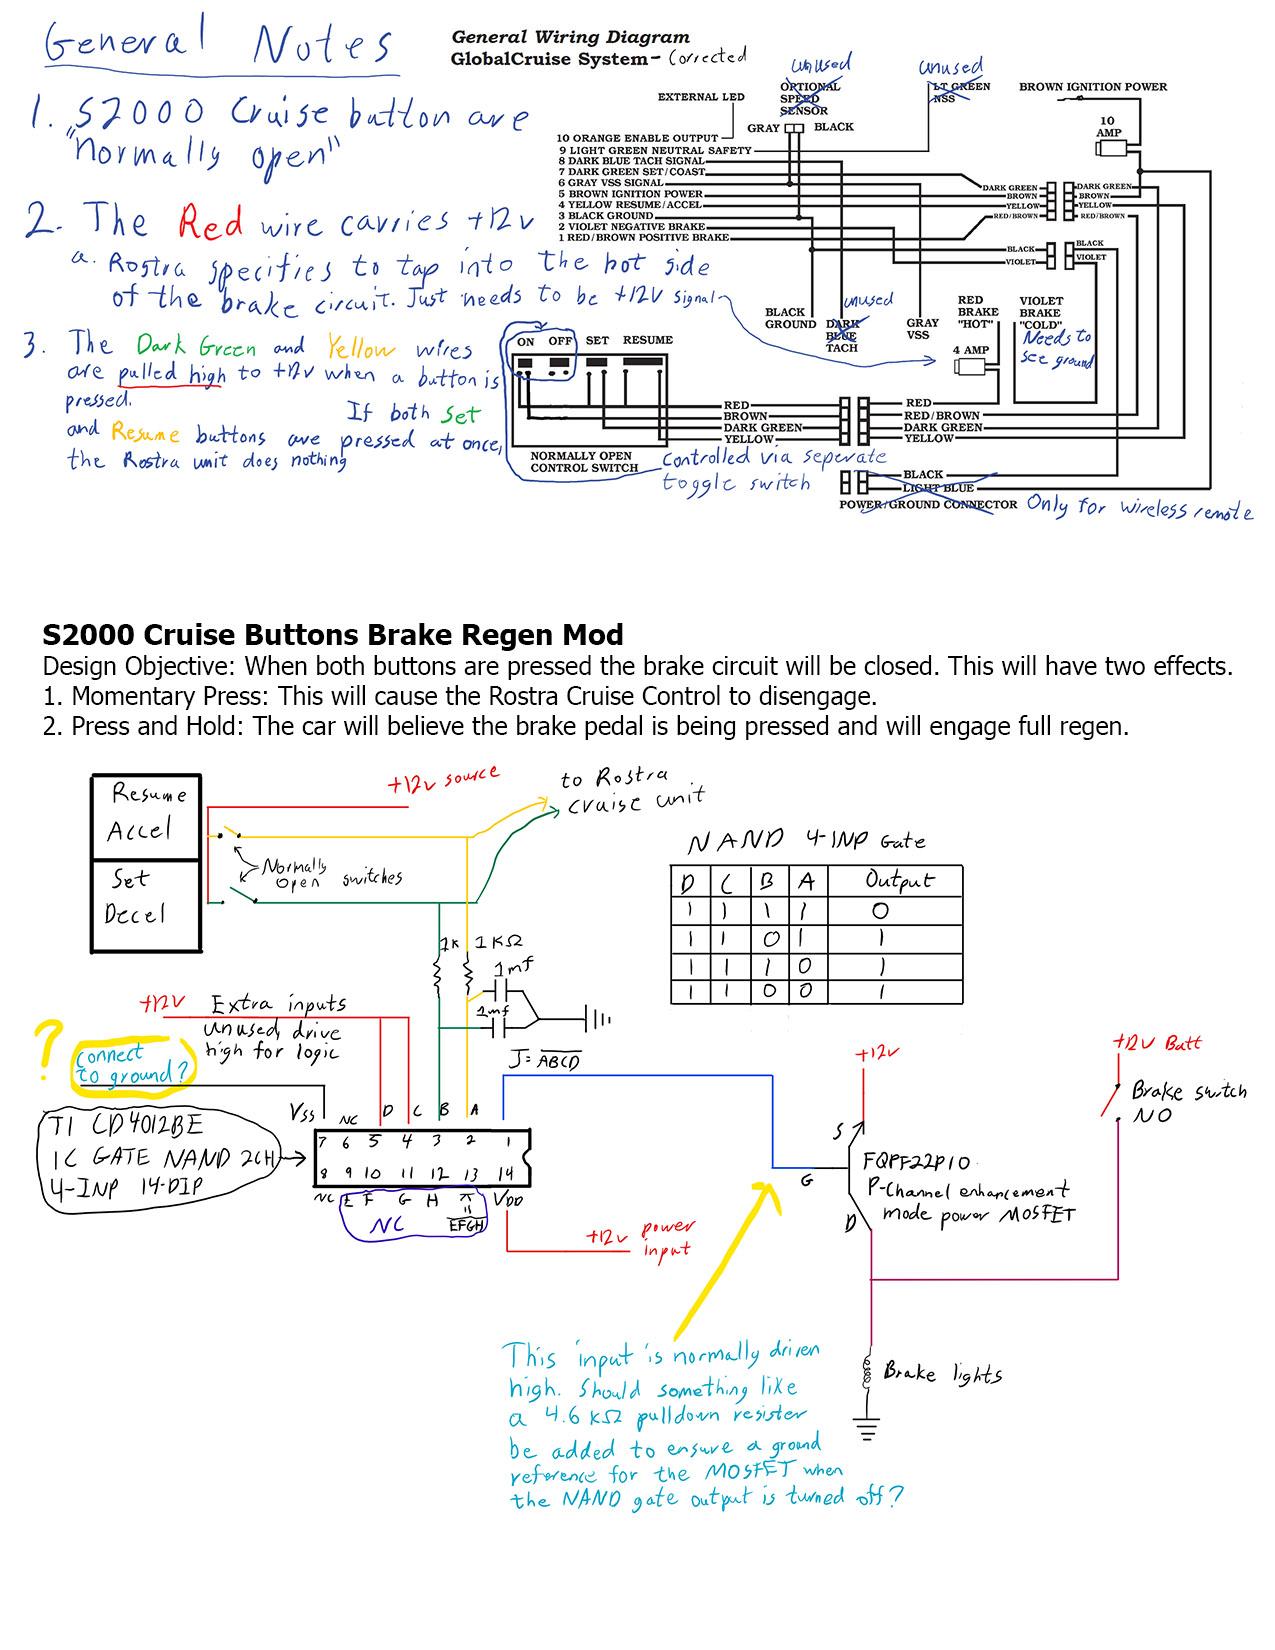 Rostra Wiring Diagram Small 1970 cj5 wiring diagram 1970 bronco wiring diagram \u2022 45 63 74 91  at mifinder.co